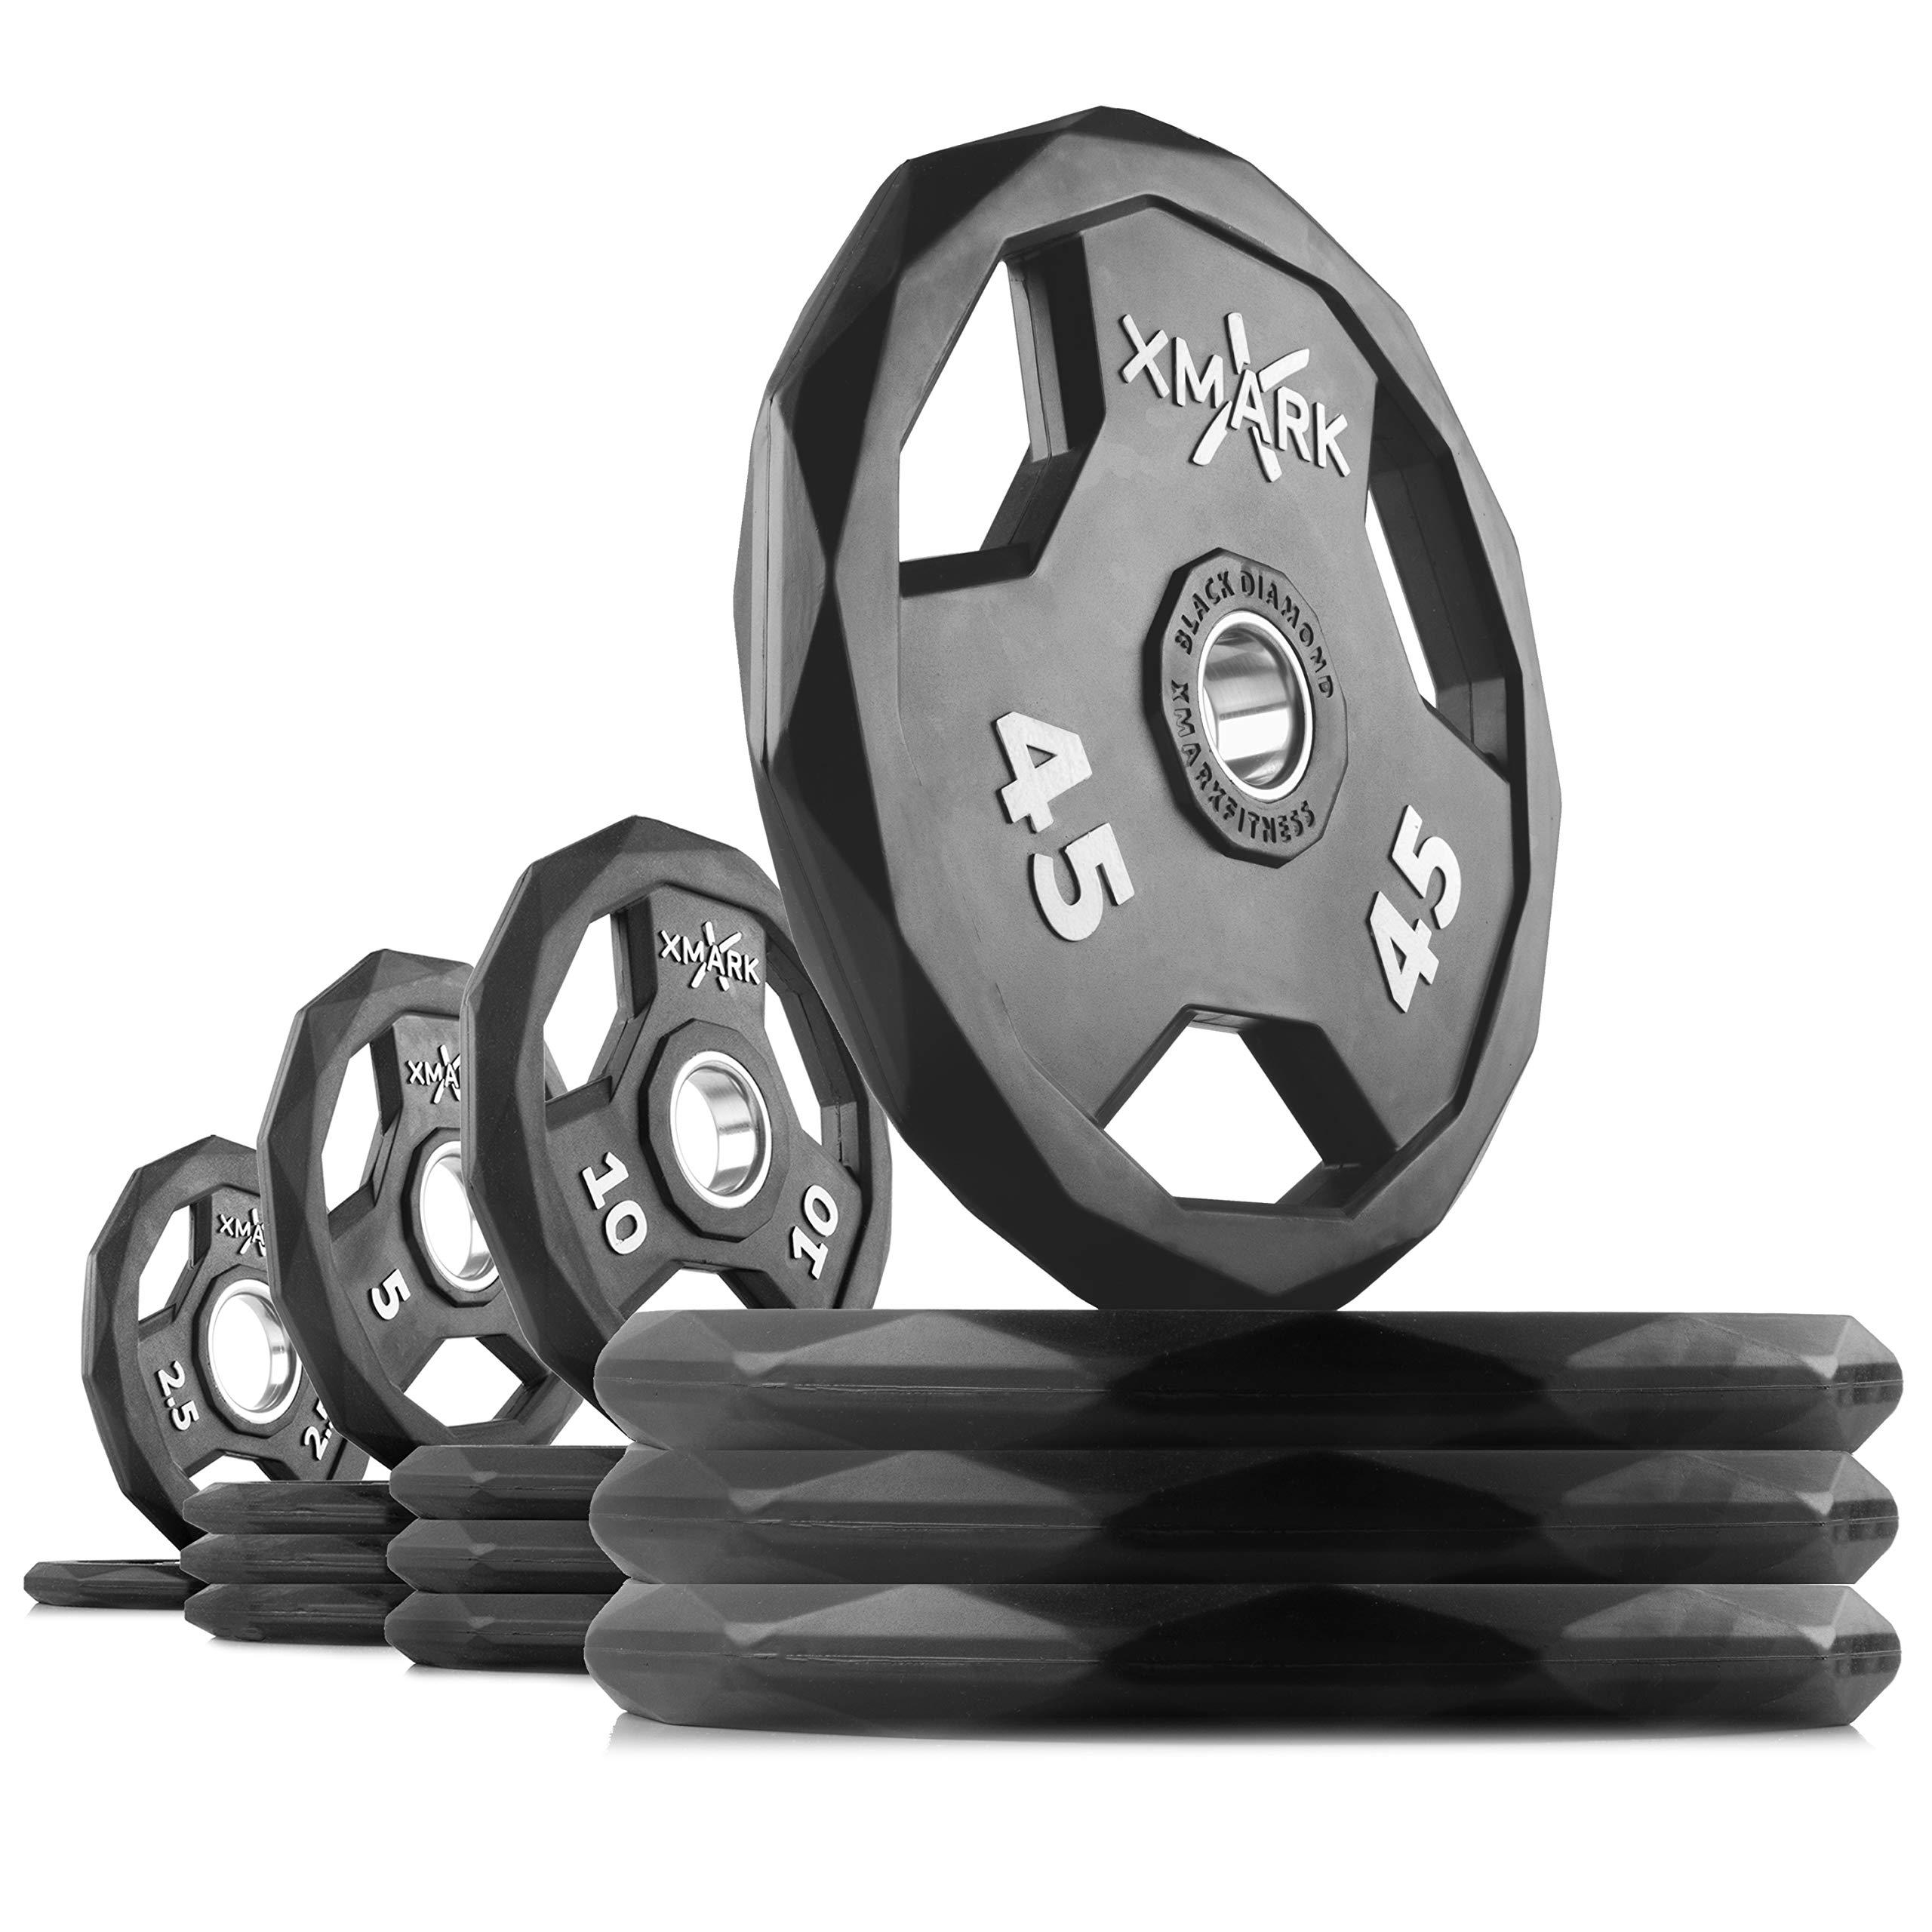 XMark Black Diamond 245 lb Set Olympic Weight Plates, One-Year Warranty, Patented Design